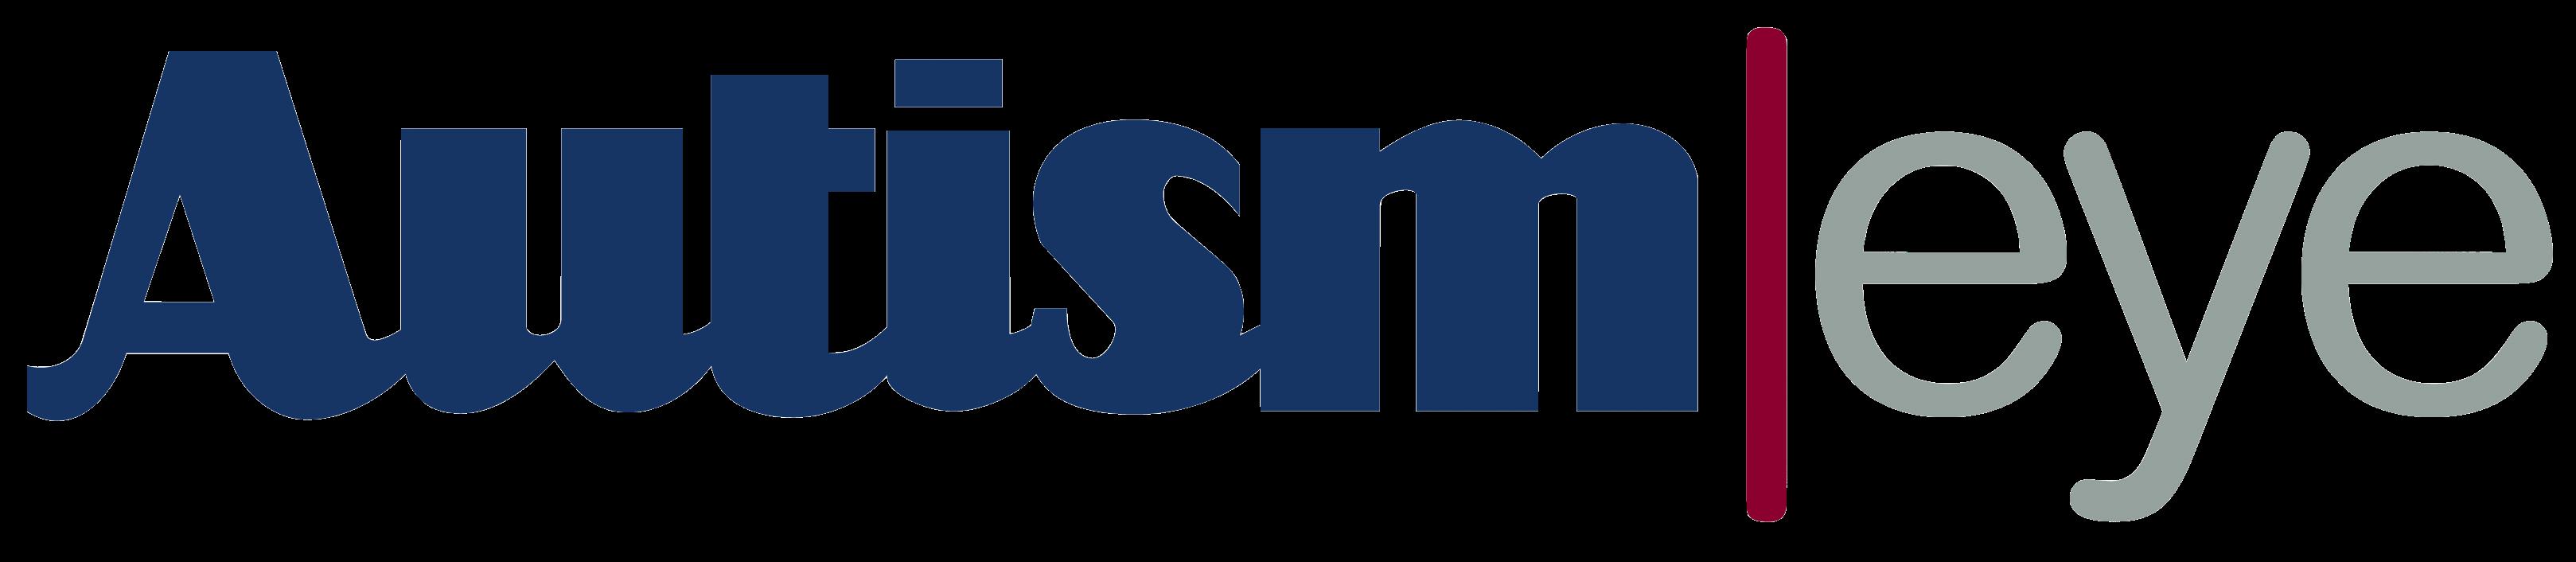 Autism eye logo